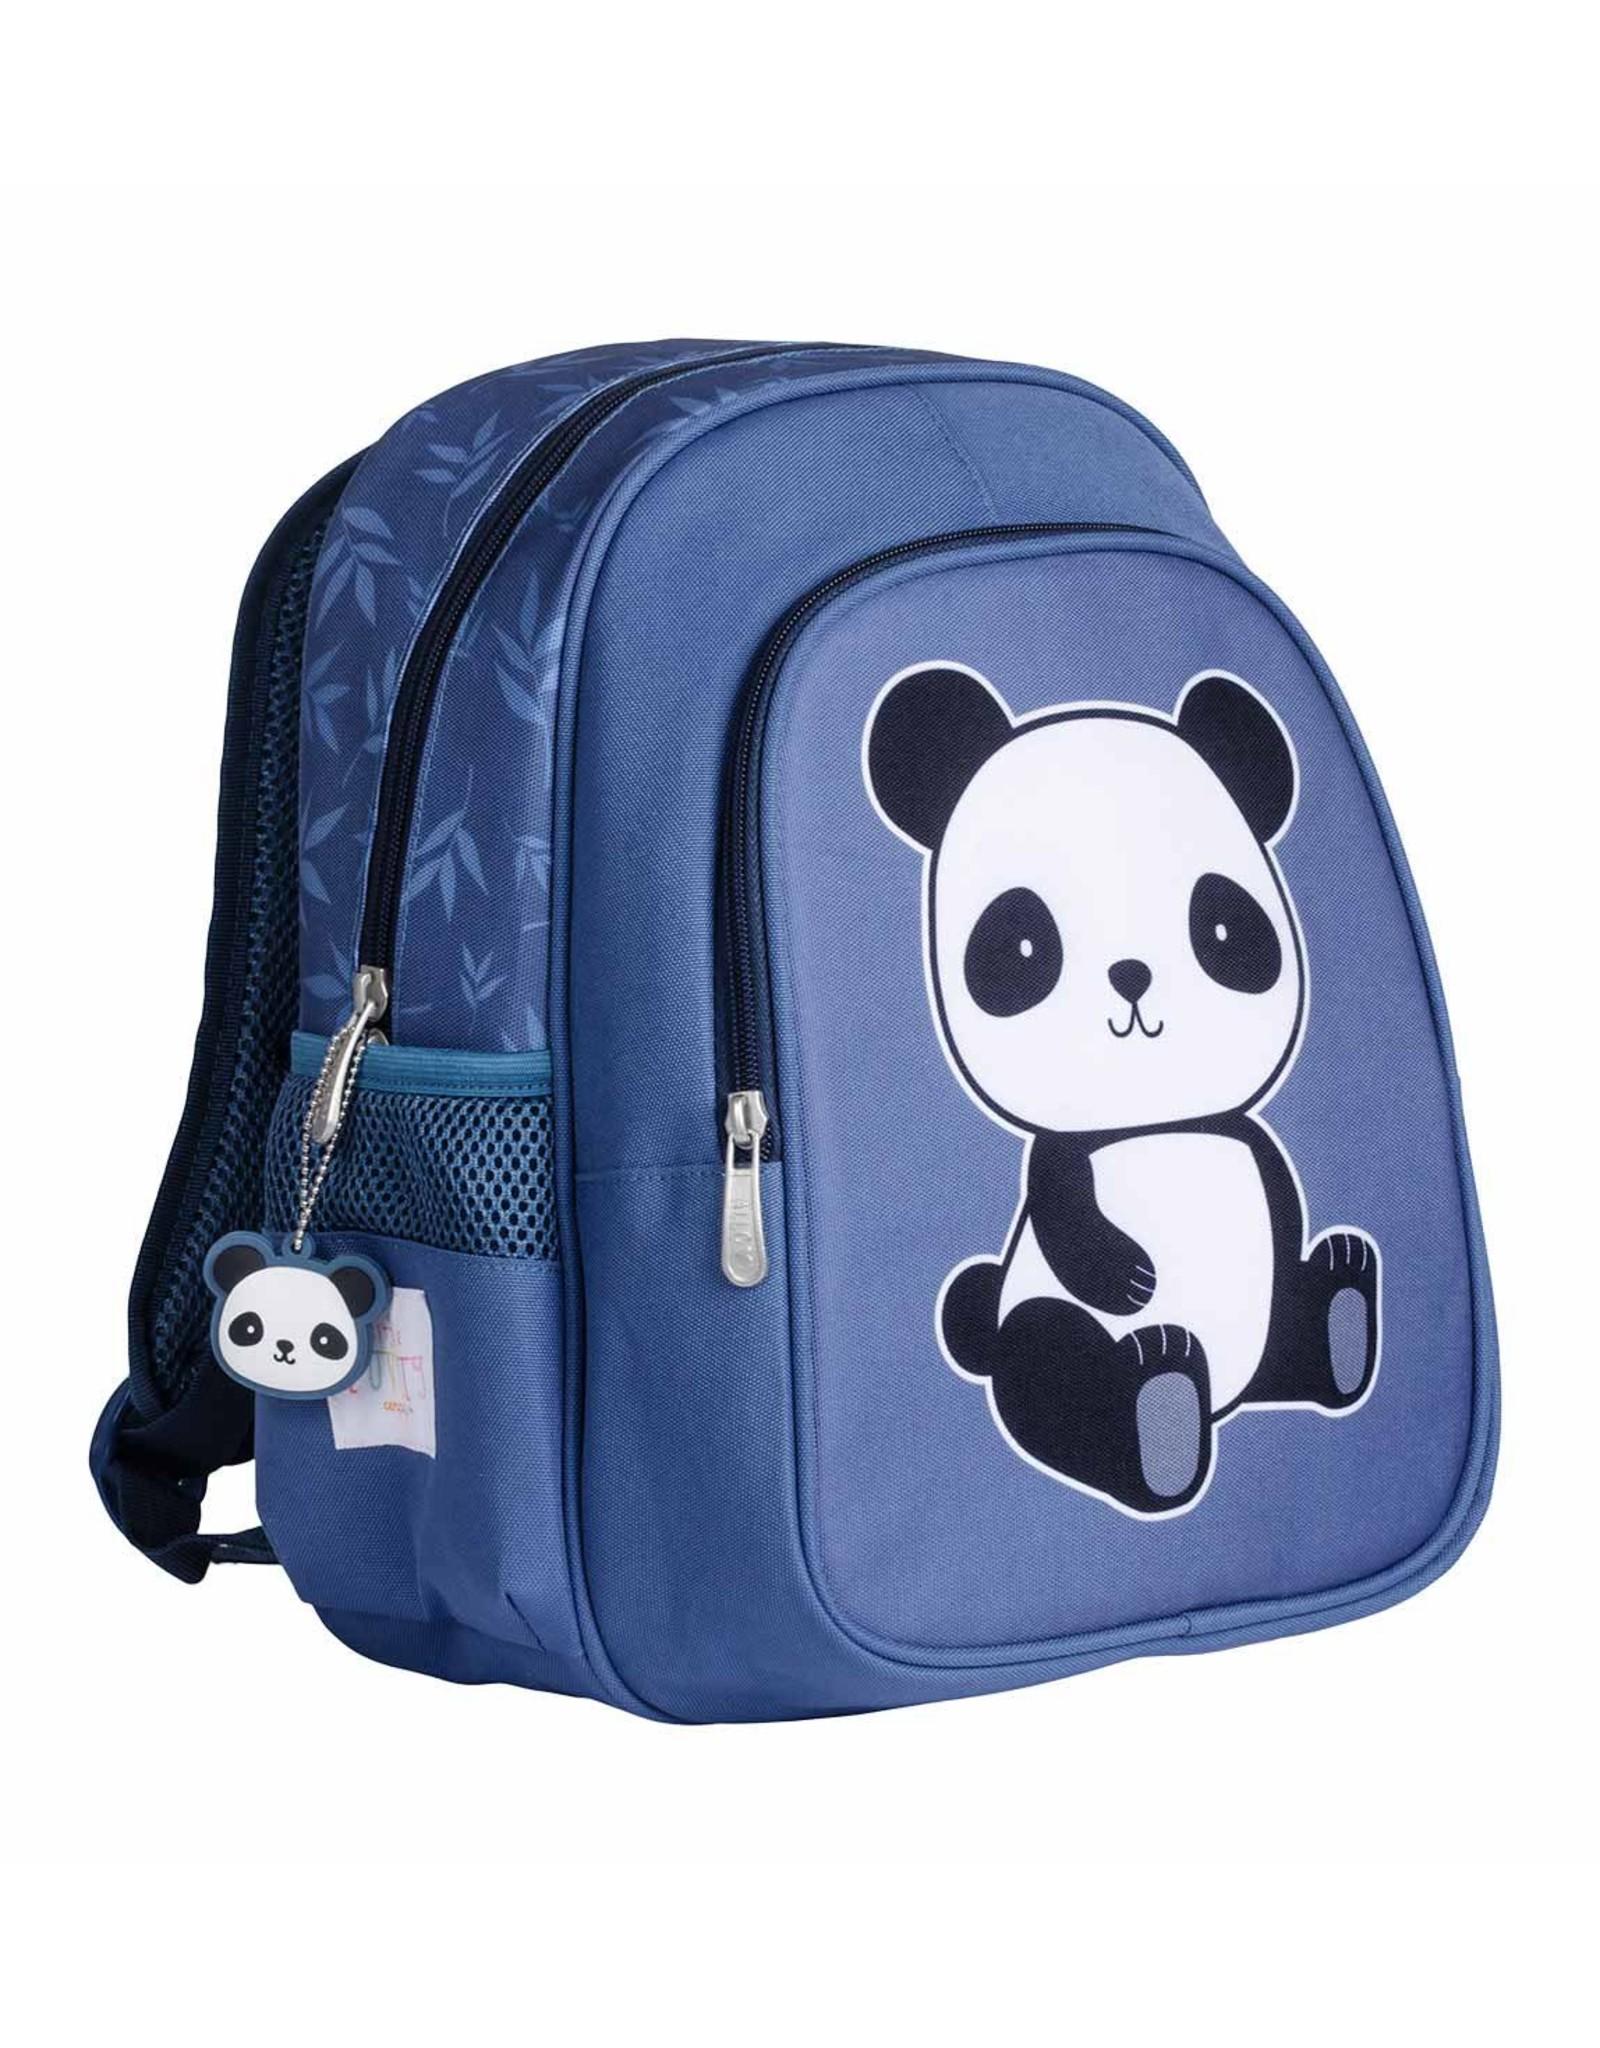 Geïsoleerde rugzak panda